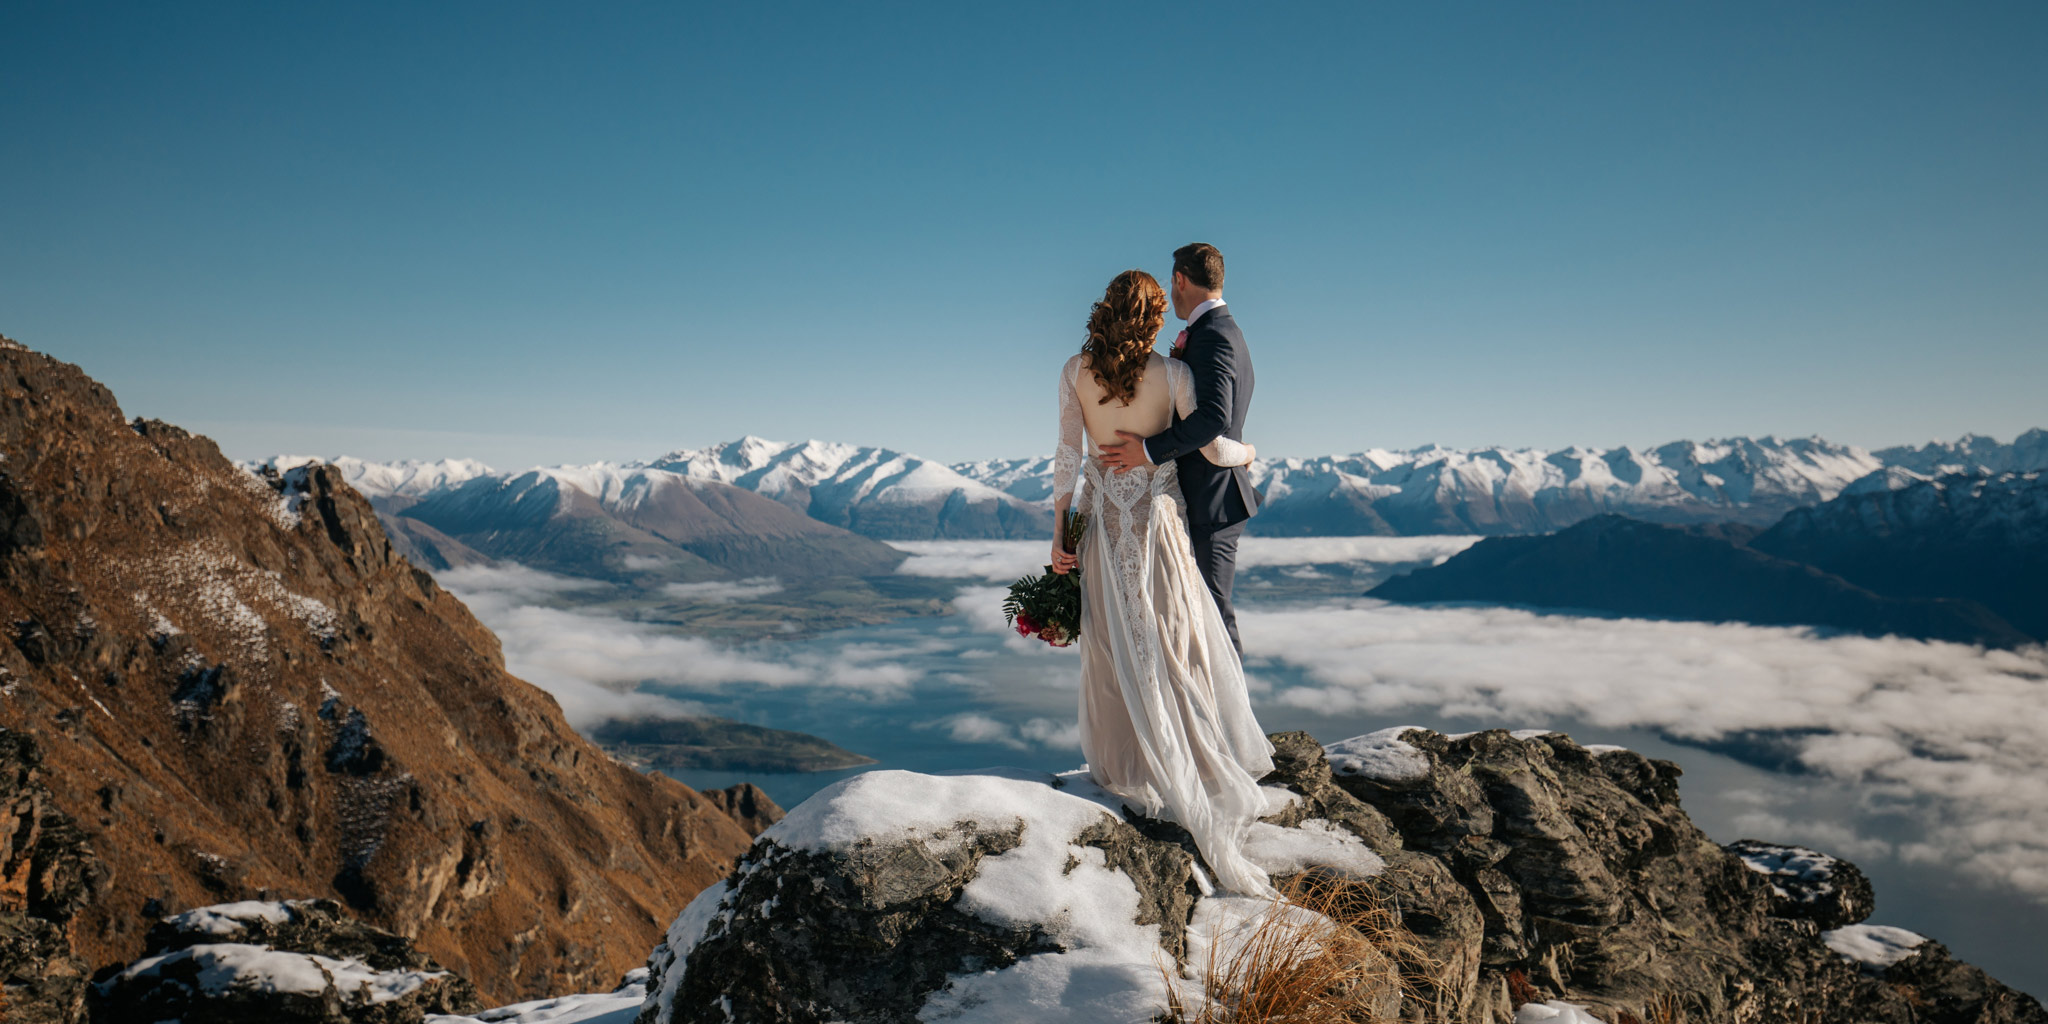 The ledge elopement wedding